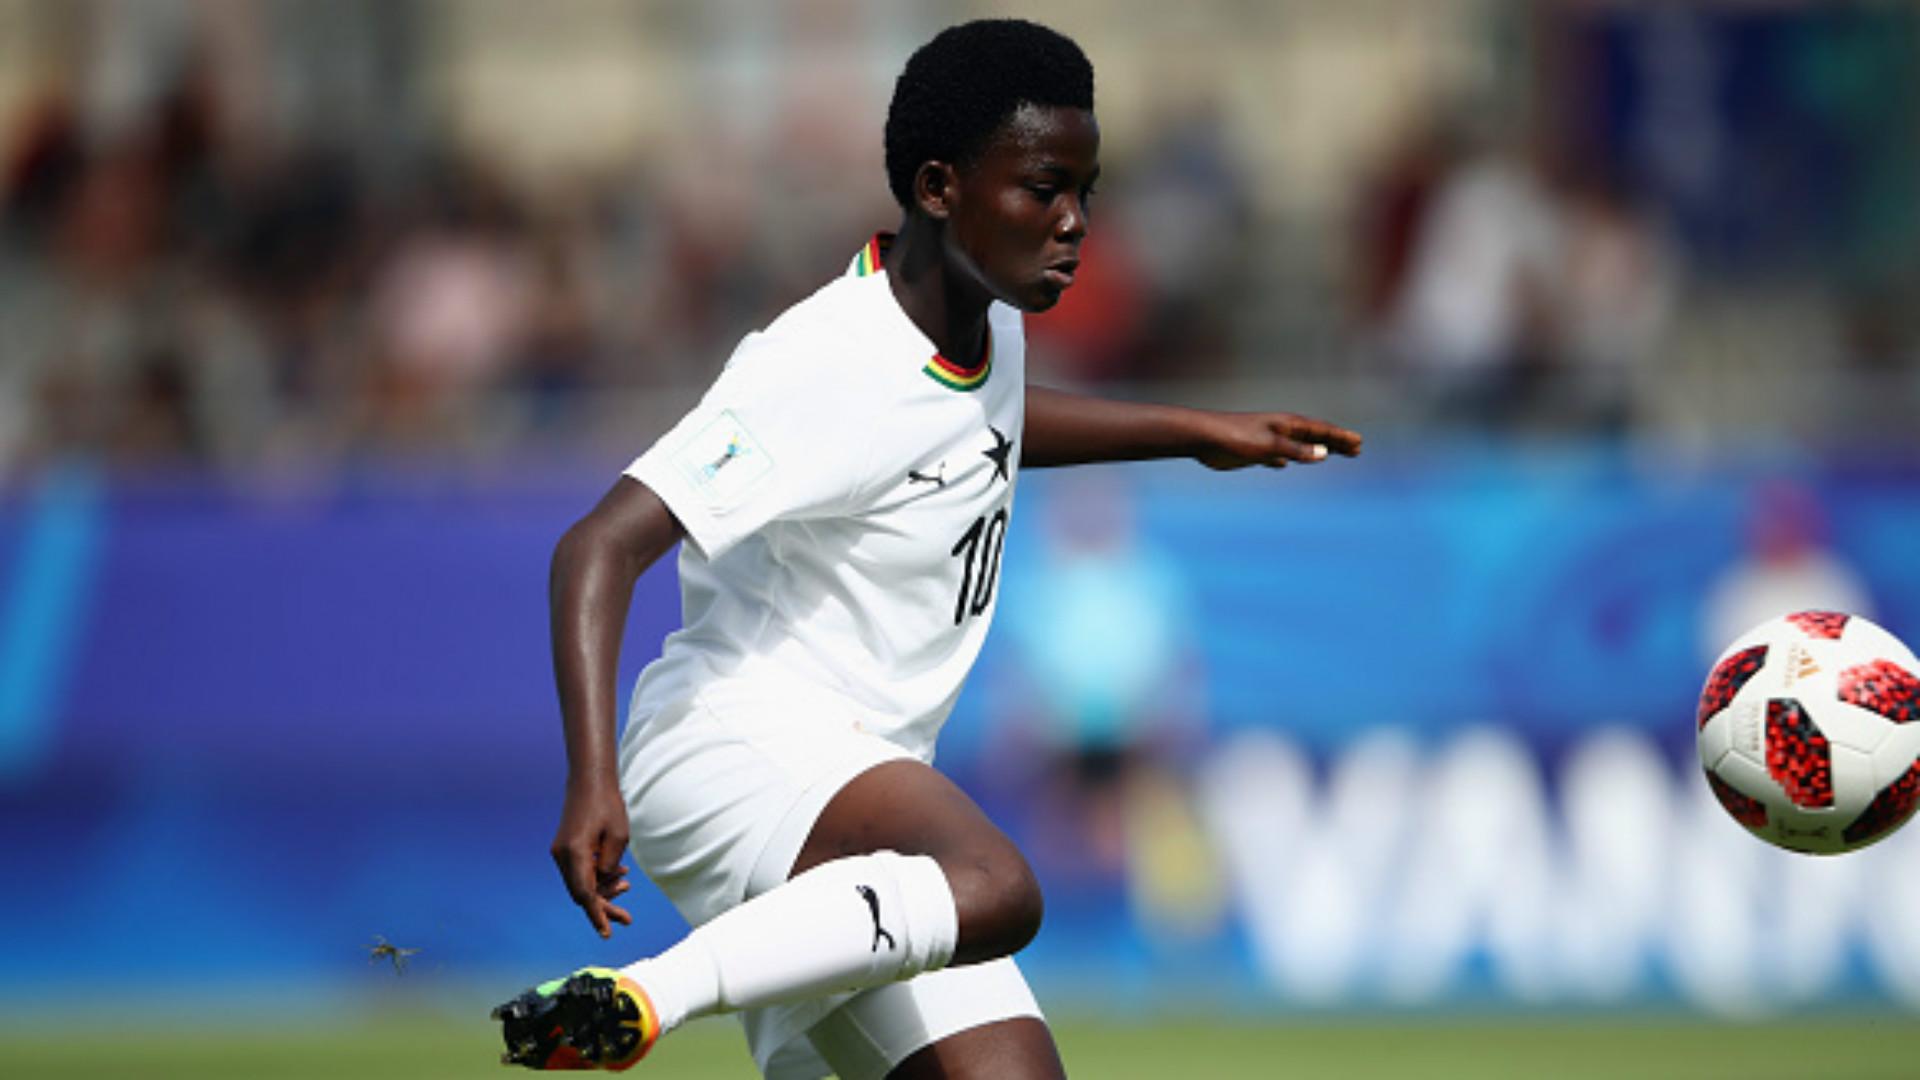 Abambila: Ghana midfielder joins Adubea at Sporting Huelva